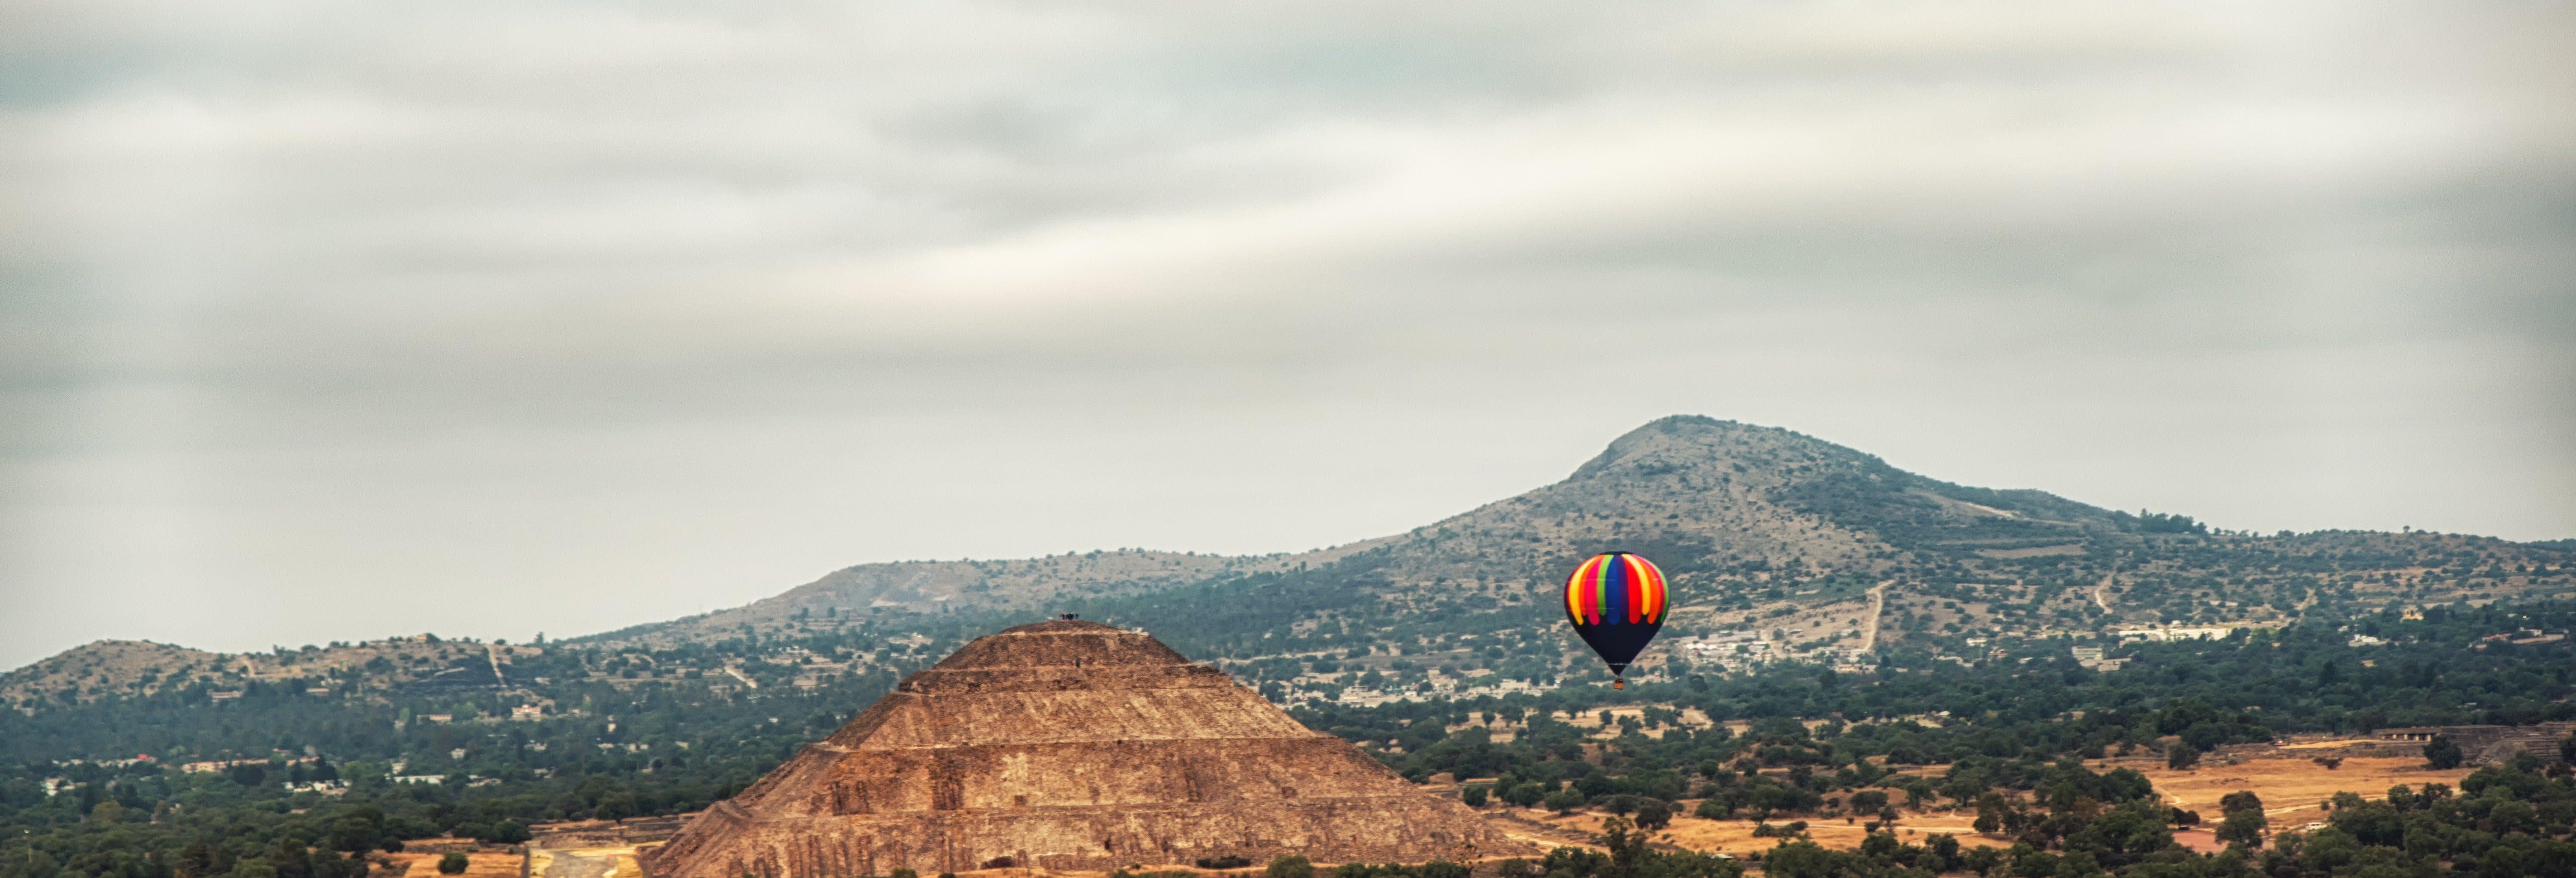 Teotihuacán Private Hot Air Balloon Flight